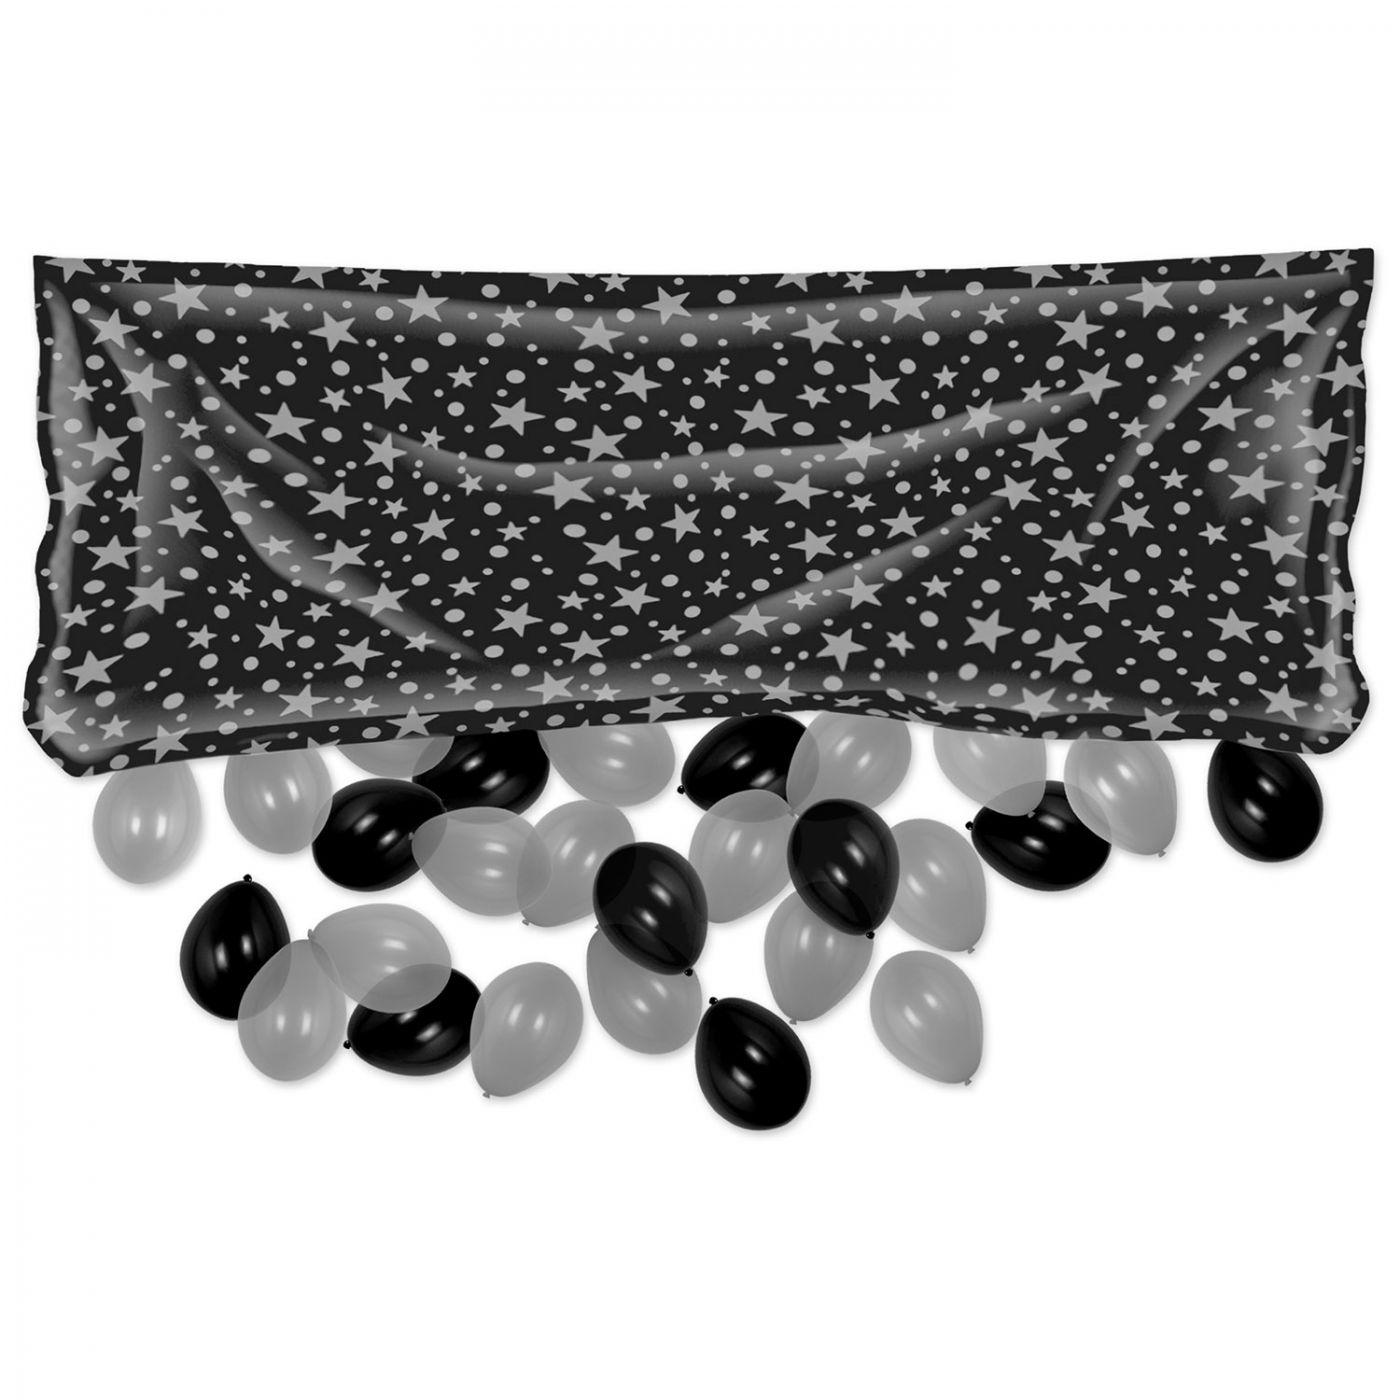 Pkgd Plastic Balloon Bag image